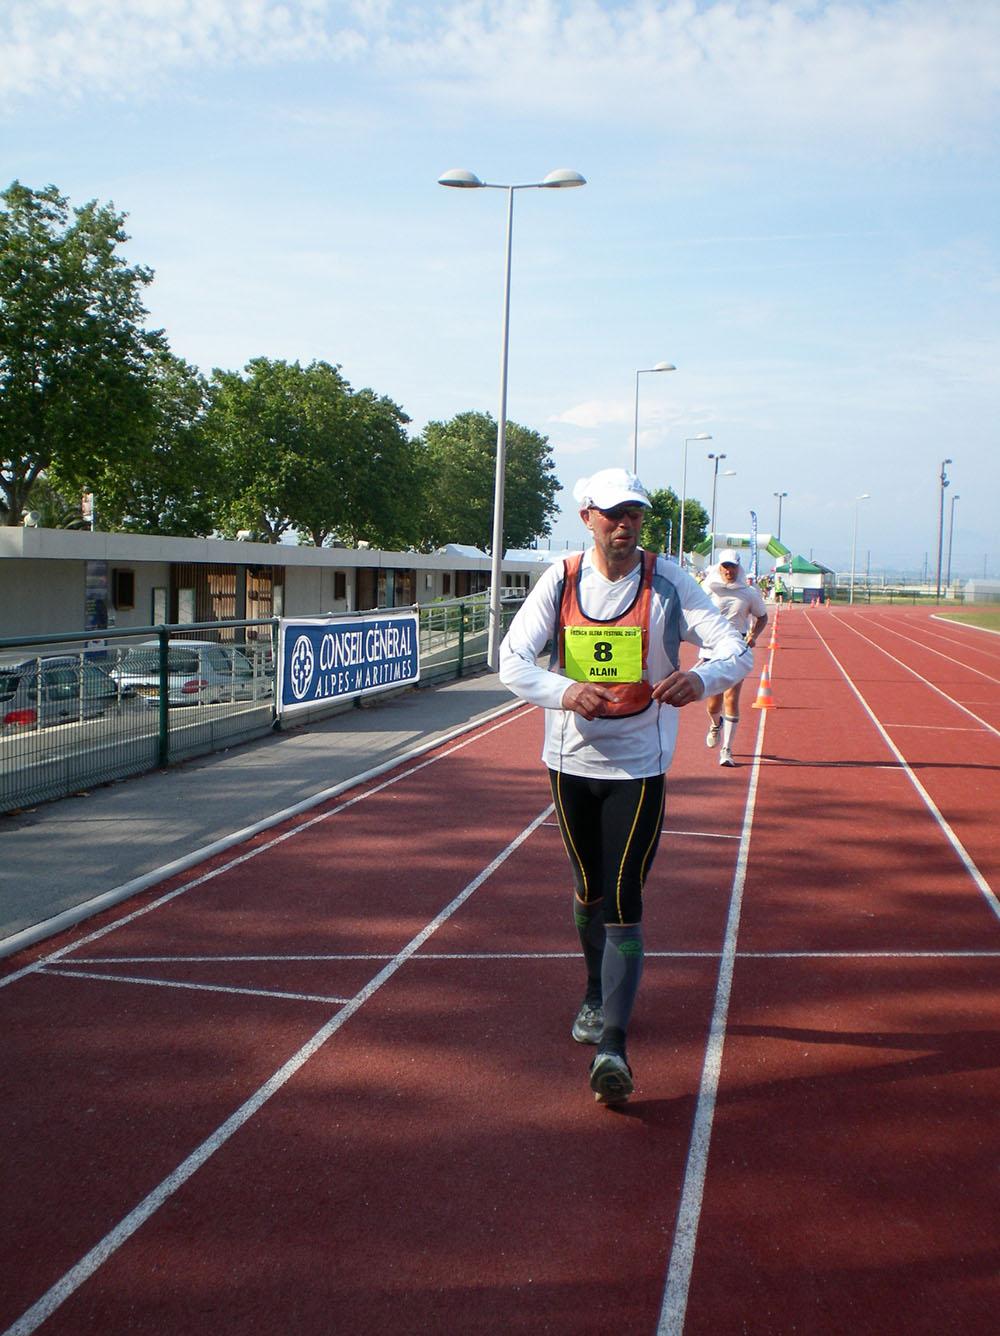 Alain = 8,5 Km/h